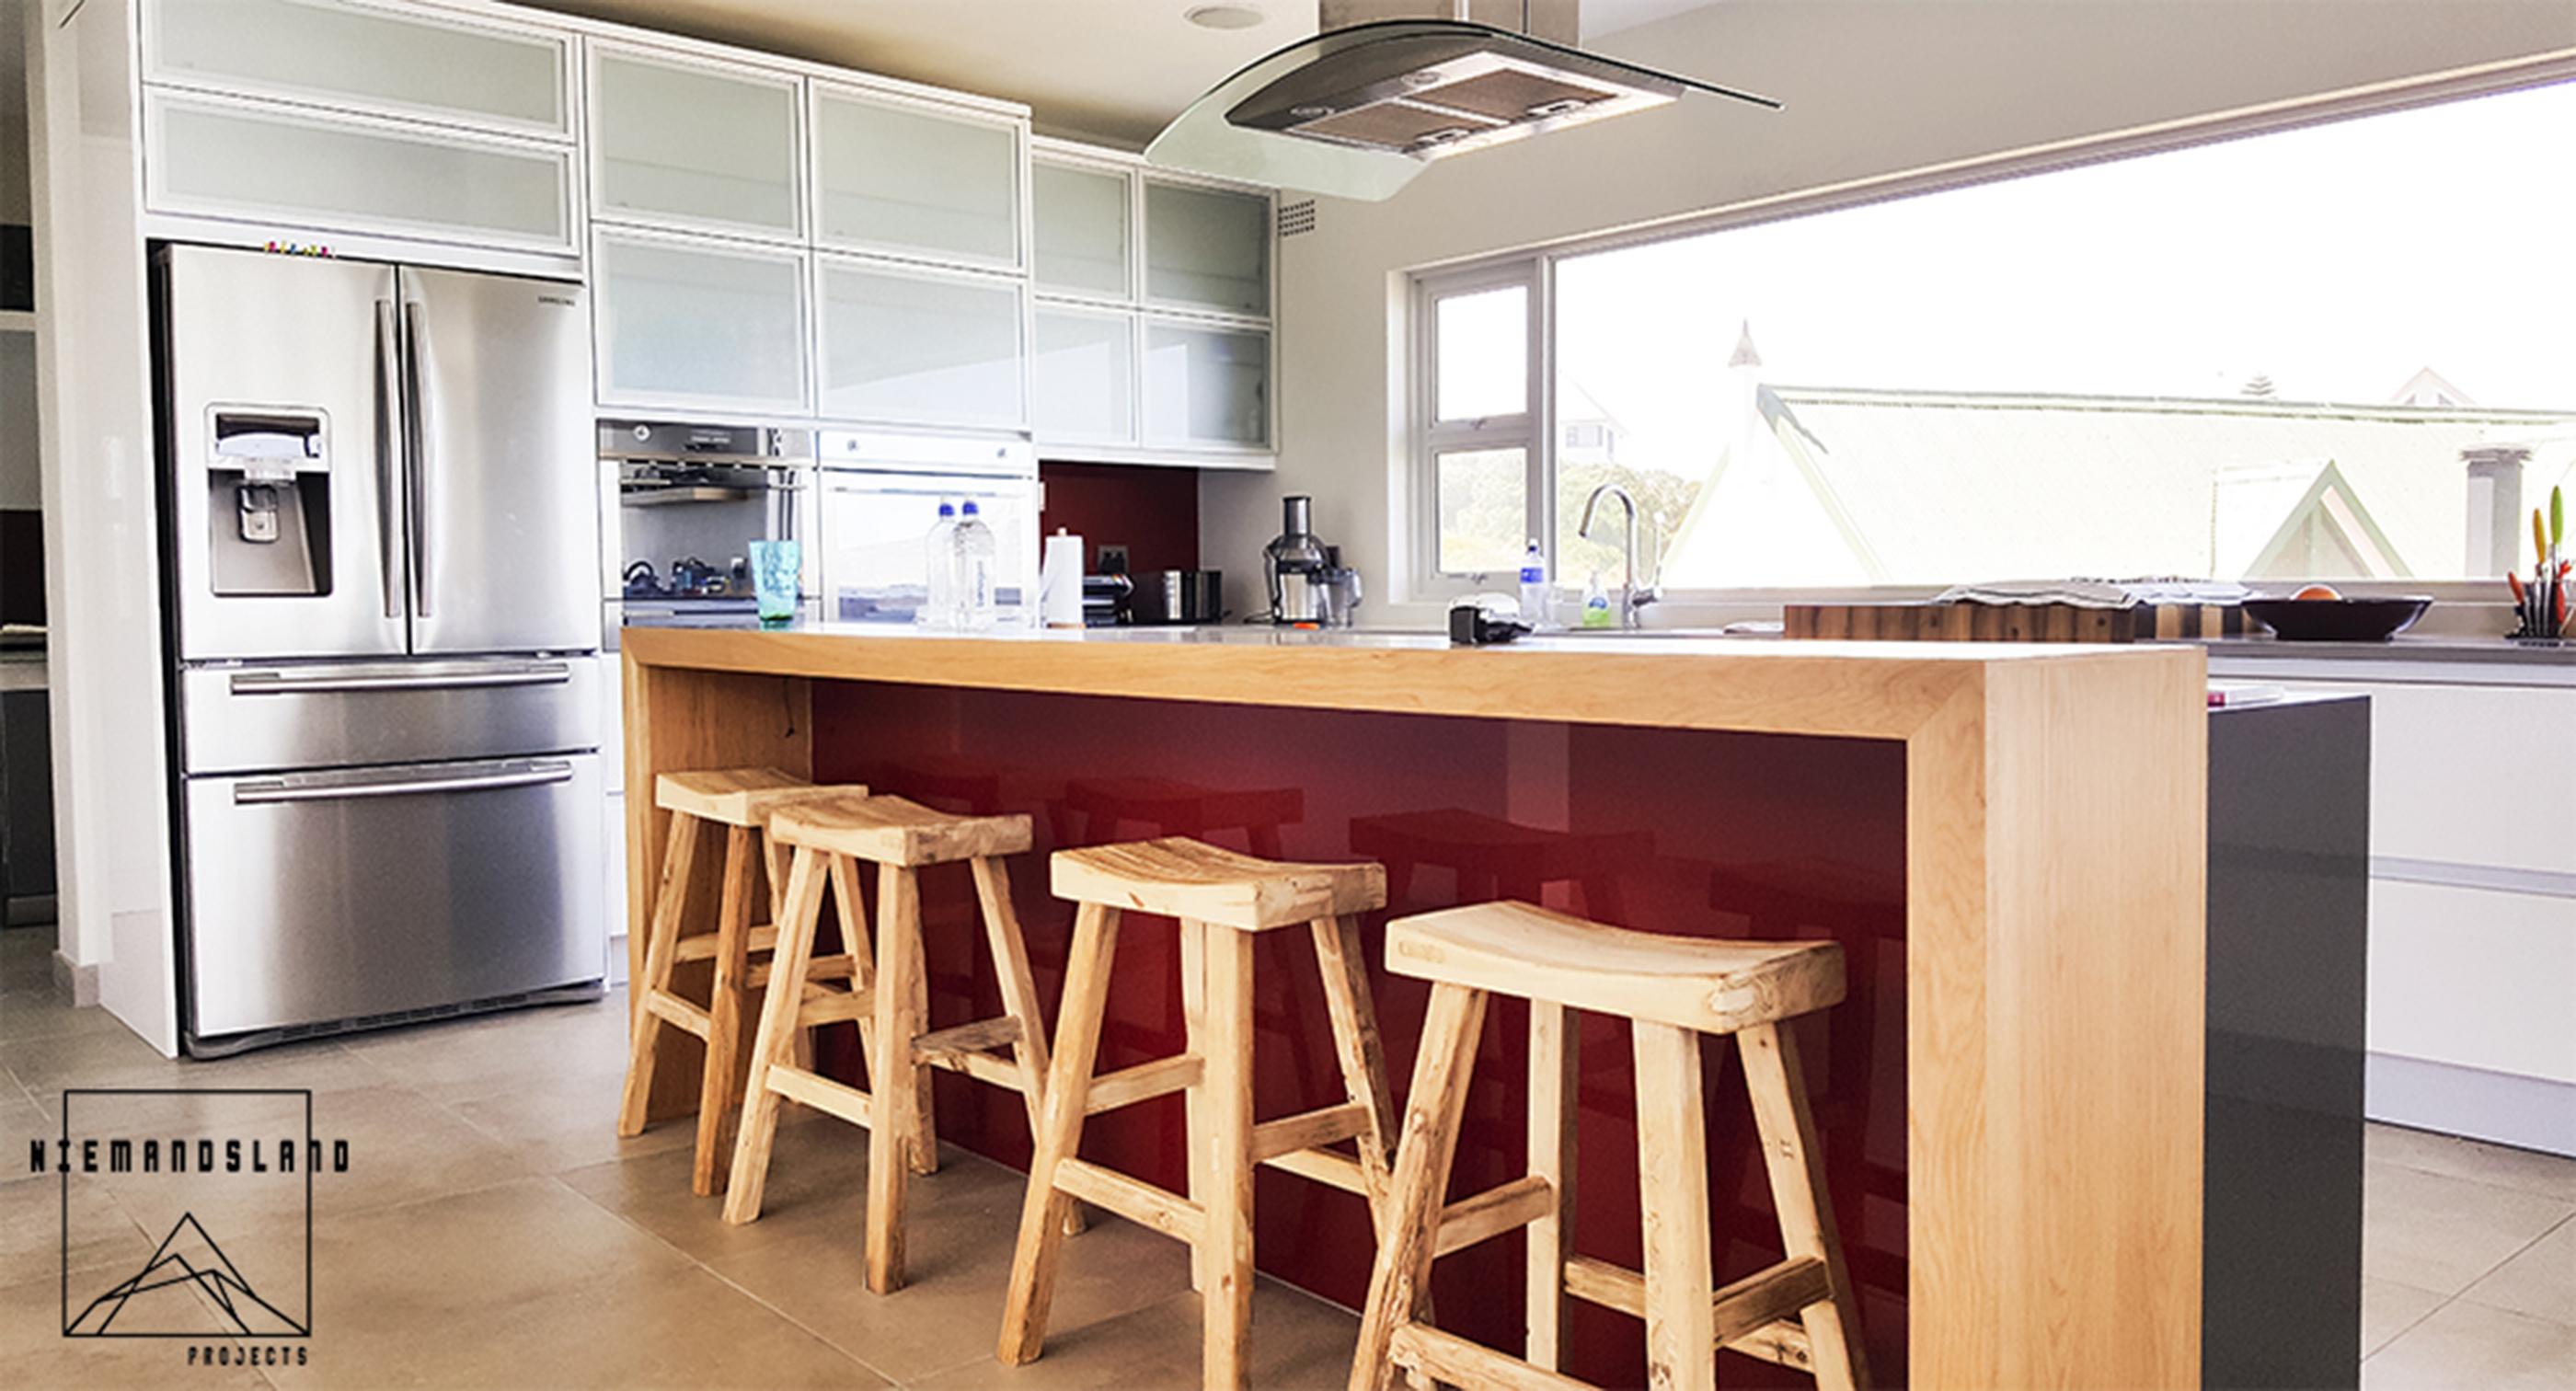 kitchen - Niemandsland and cadan cupboards